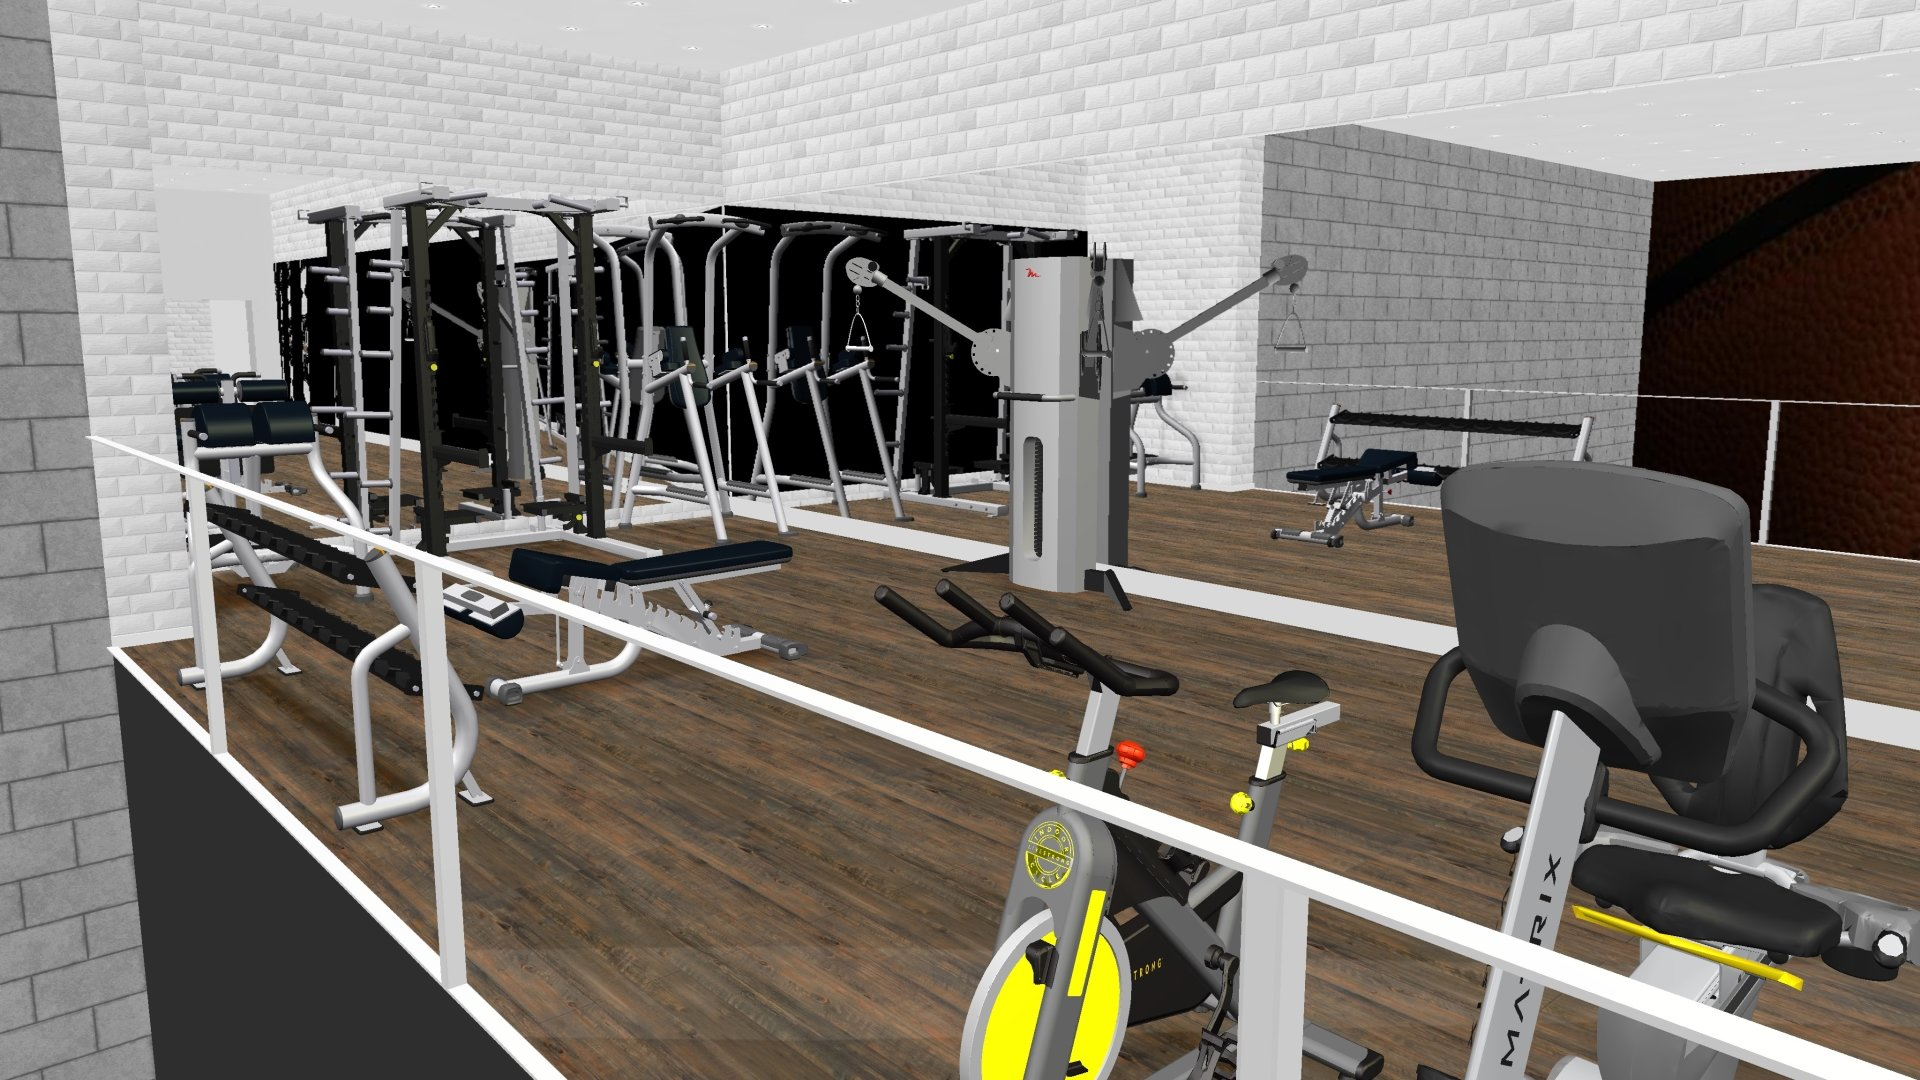 3D Design Brikor Strength Commercial Fitness Equipment